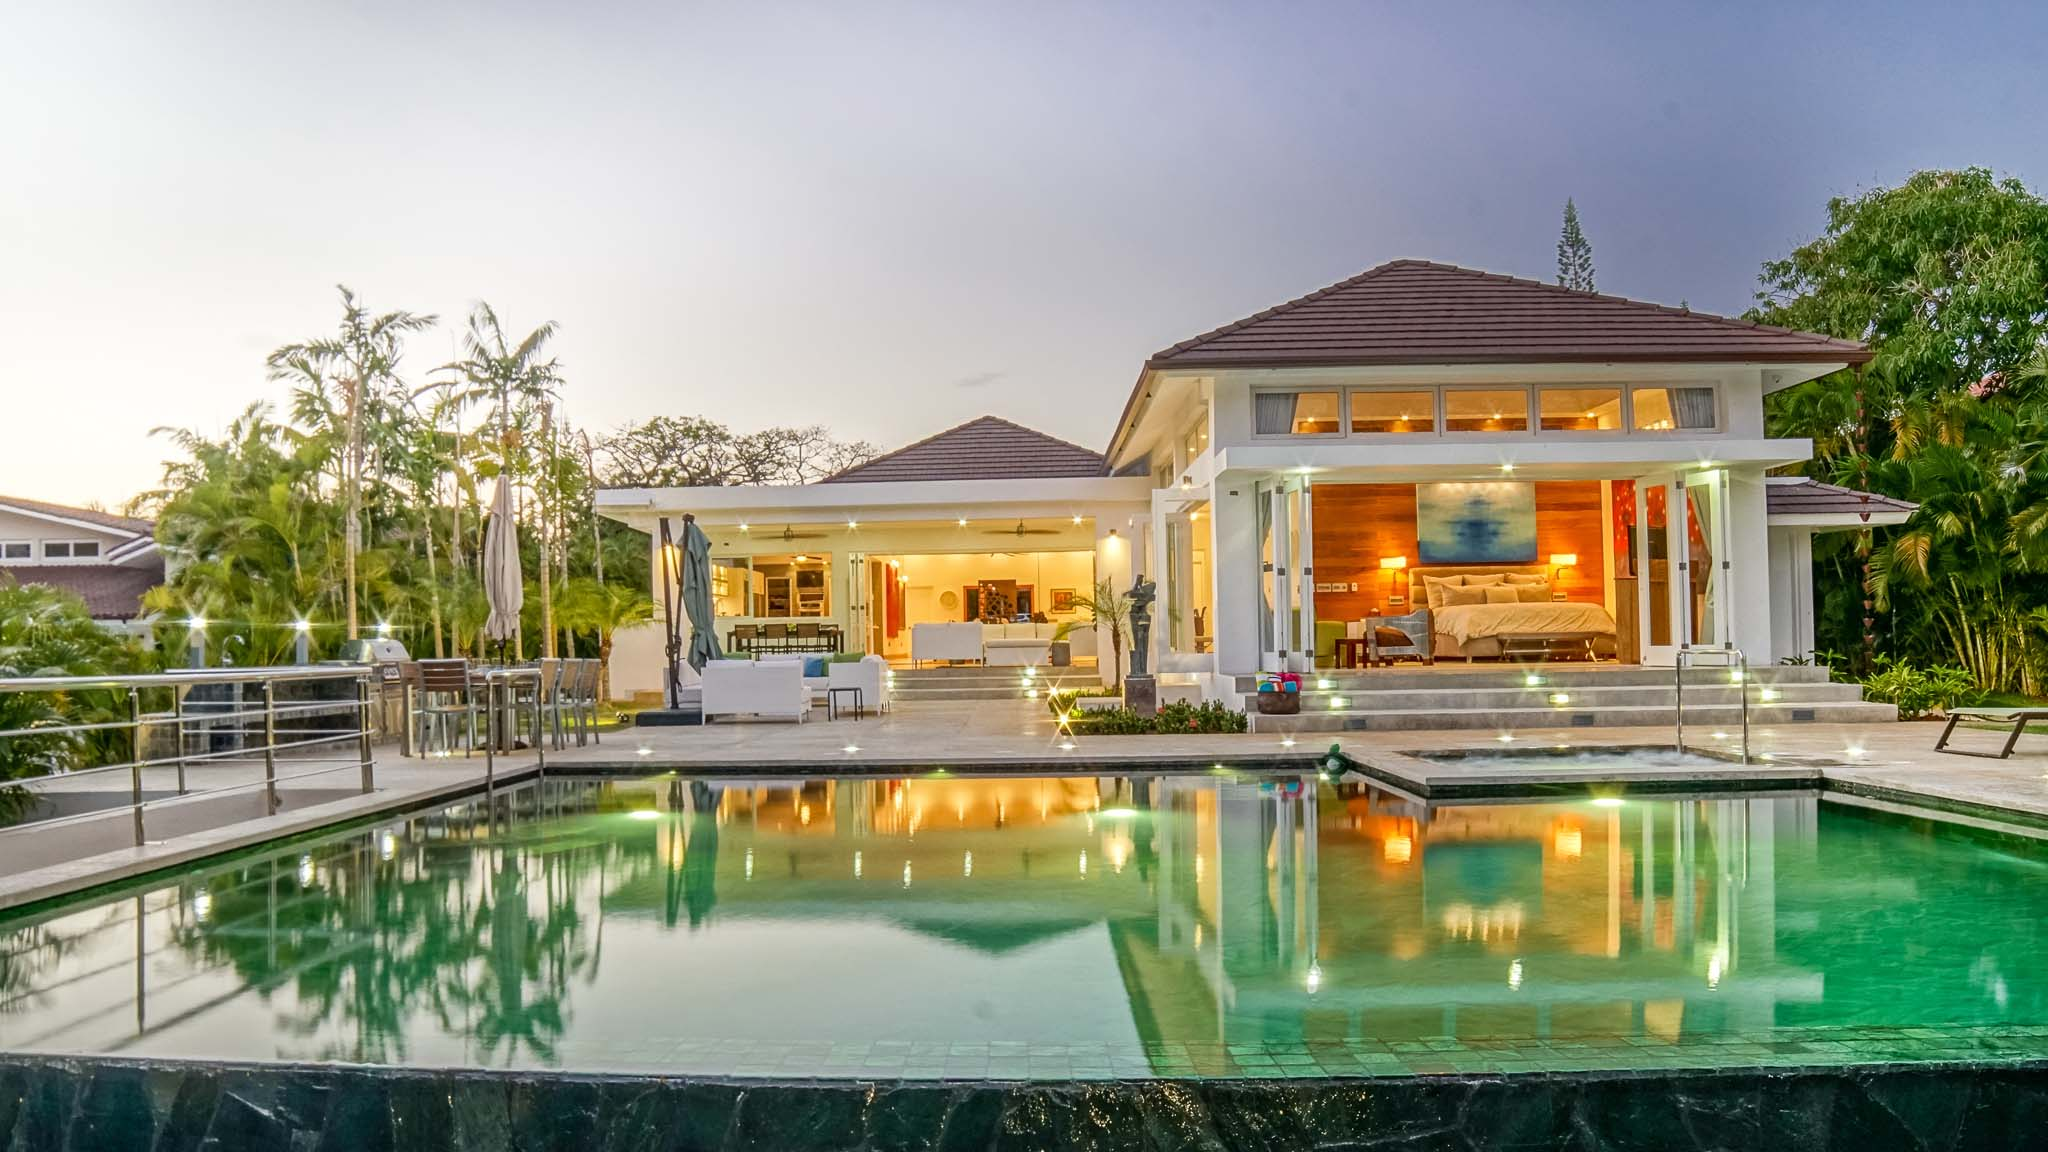 Single Family Home for Sale at Brand New, Magnificent & Modern Home with Elegance and Grace Casa De Campo, La Romana, Dominican Republic